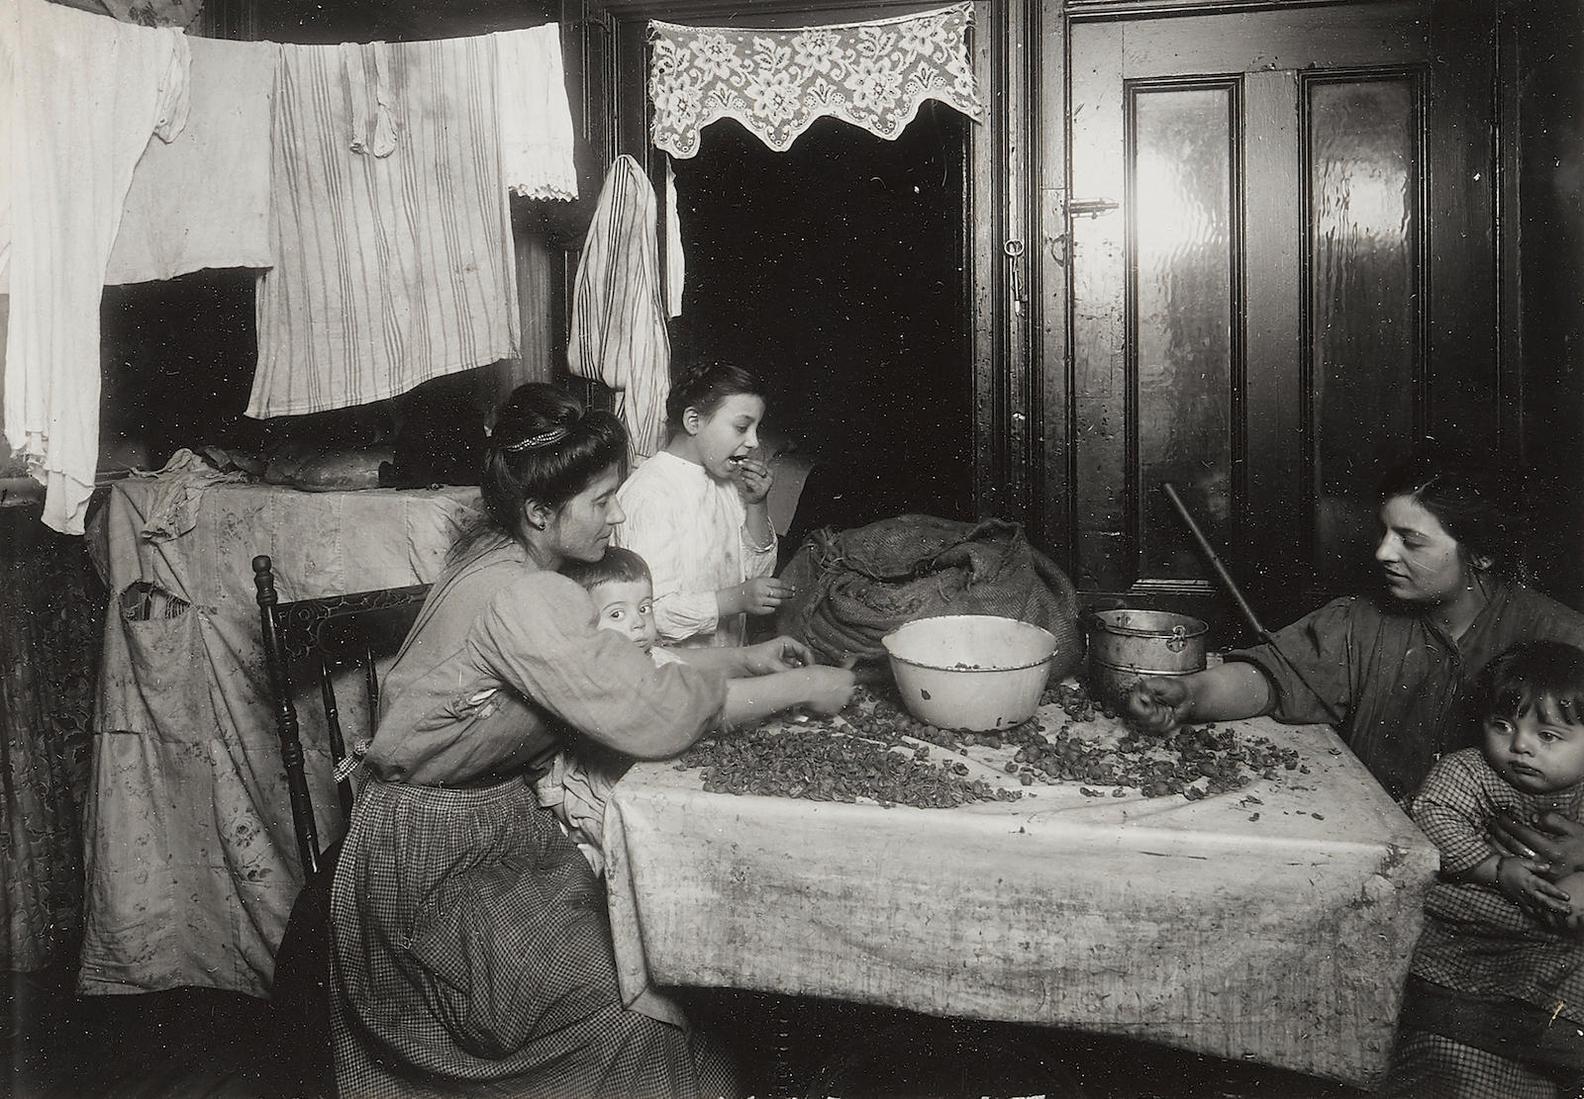 Lewis Wickes Hine-Tenement Workers-1912